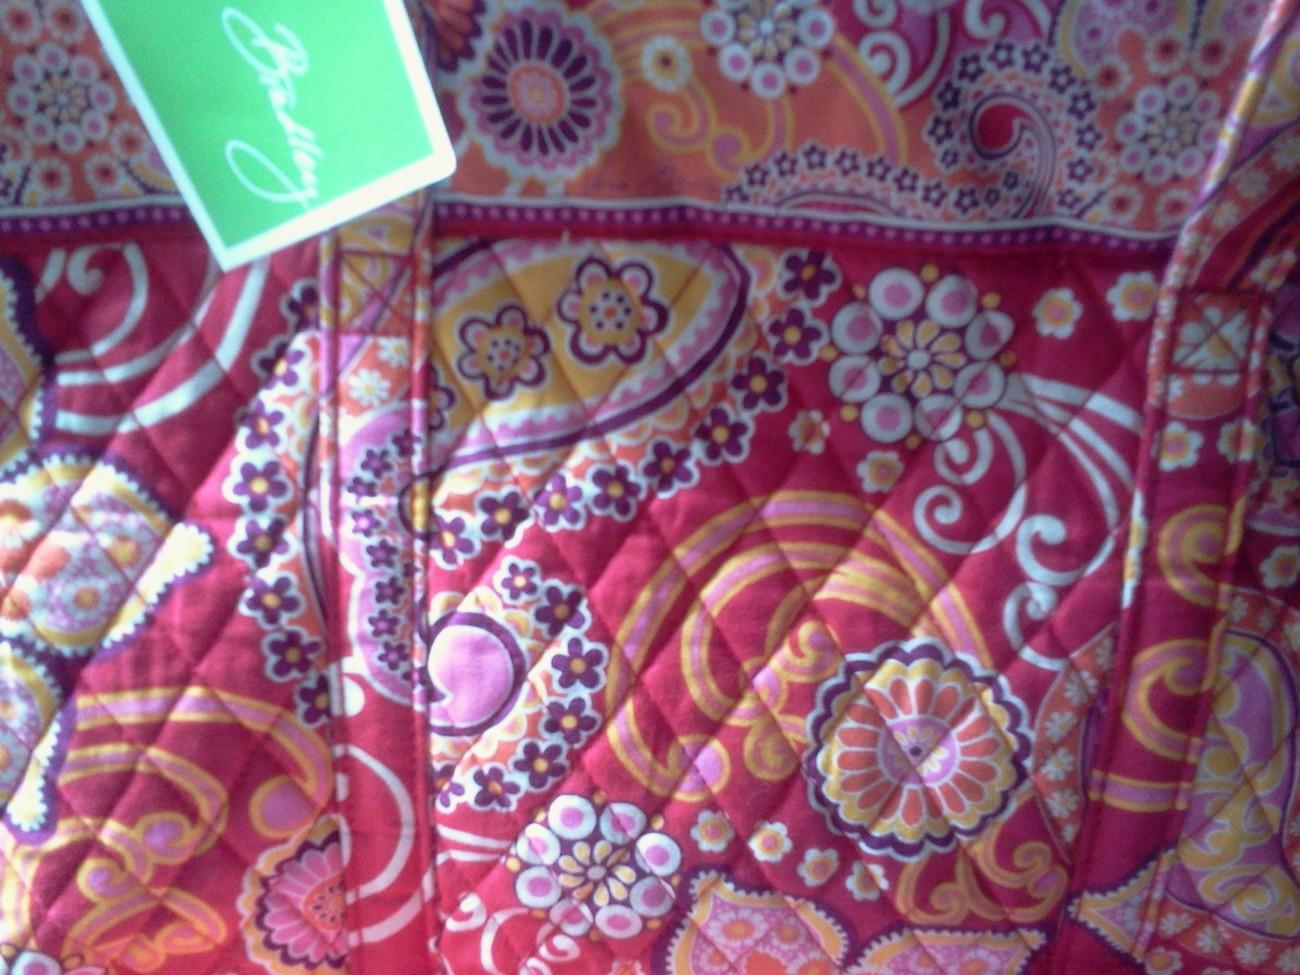 Vera Bradley Villager Raspberry Fizz Tote NWT 10326-003